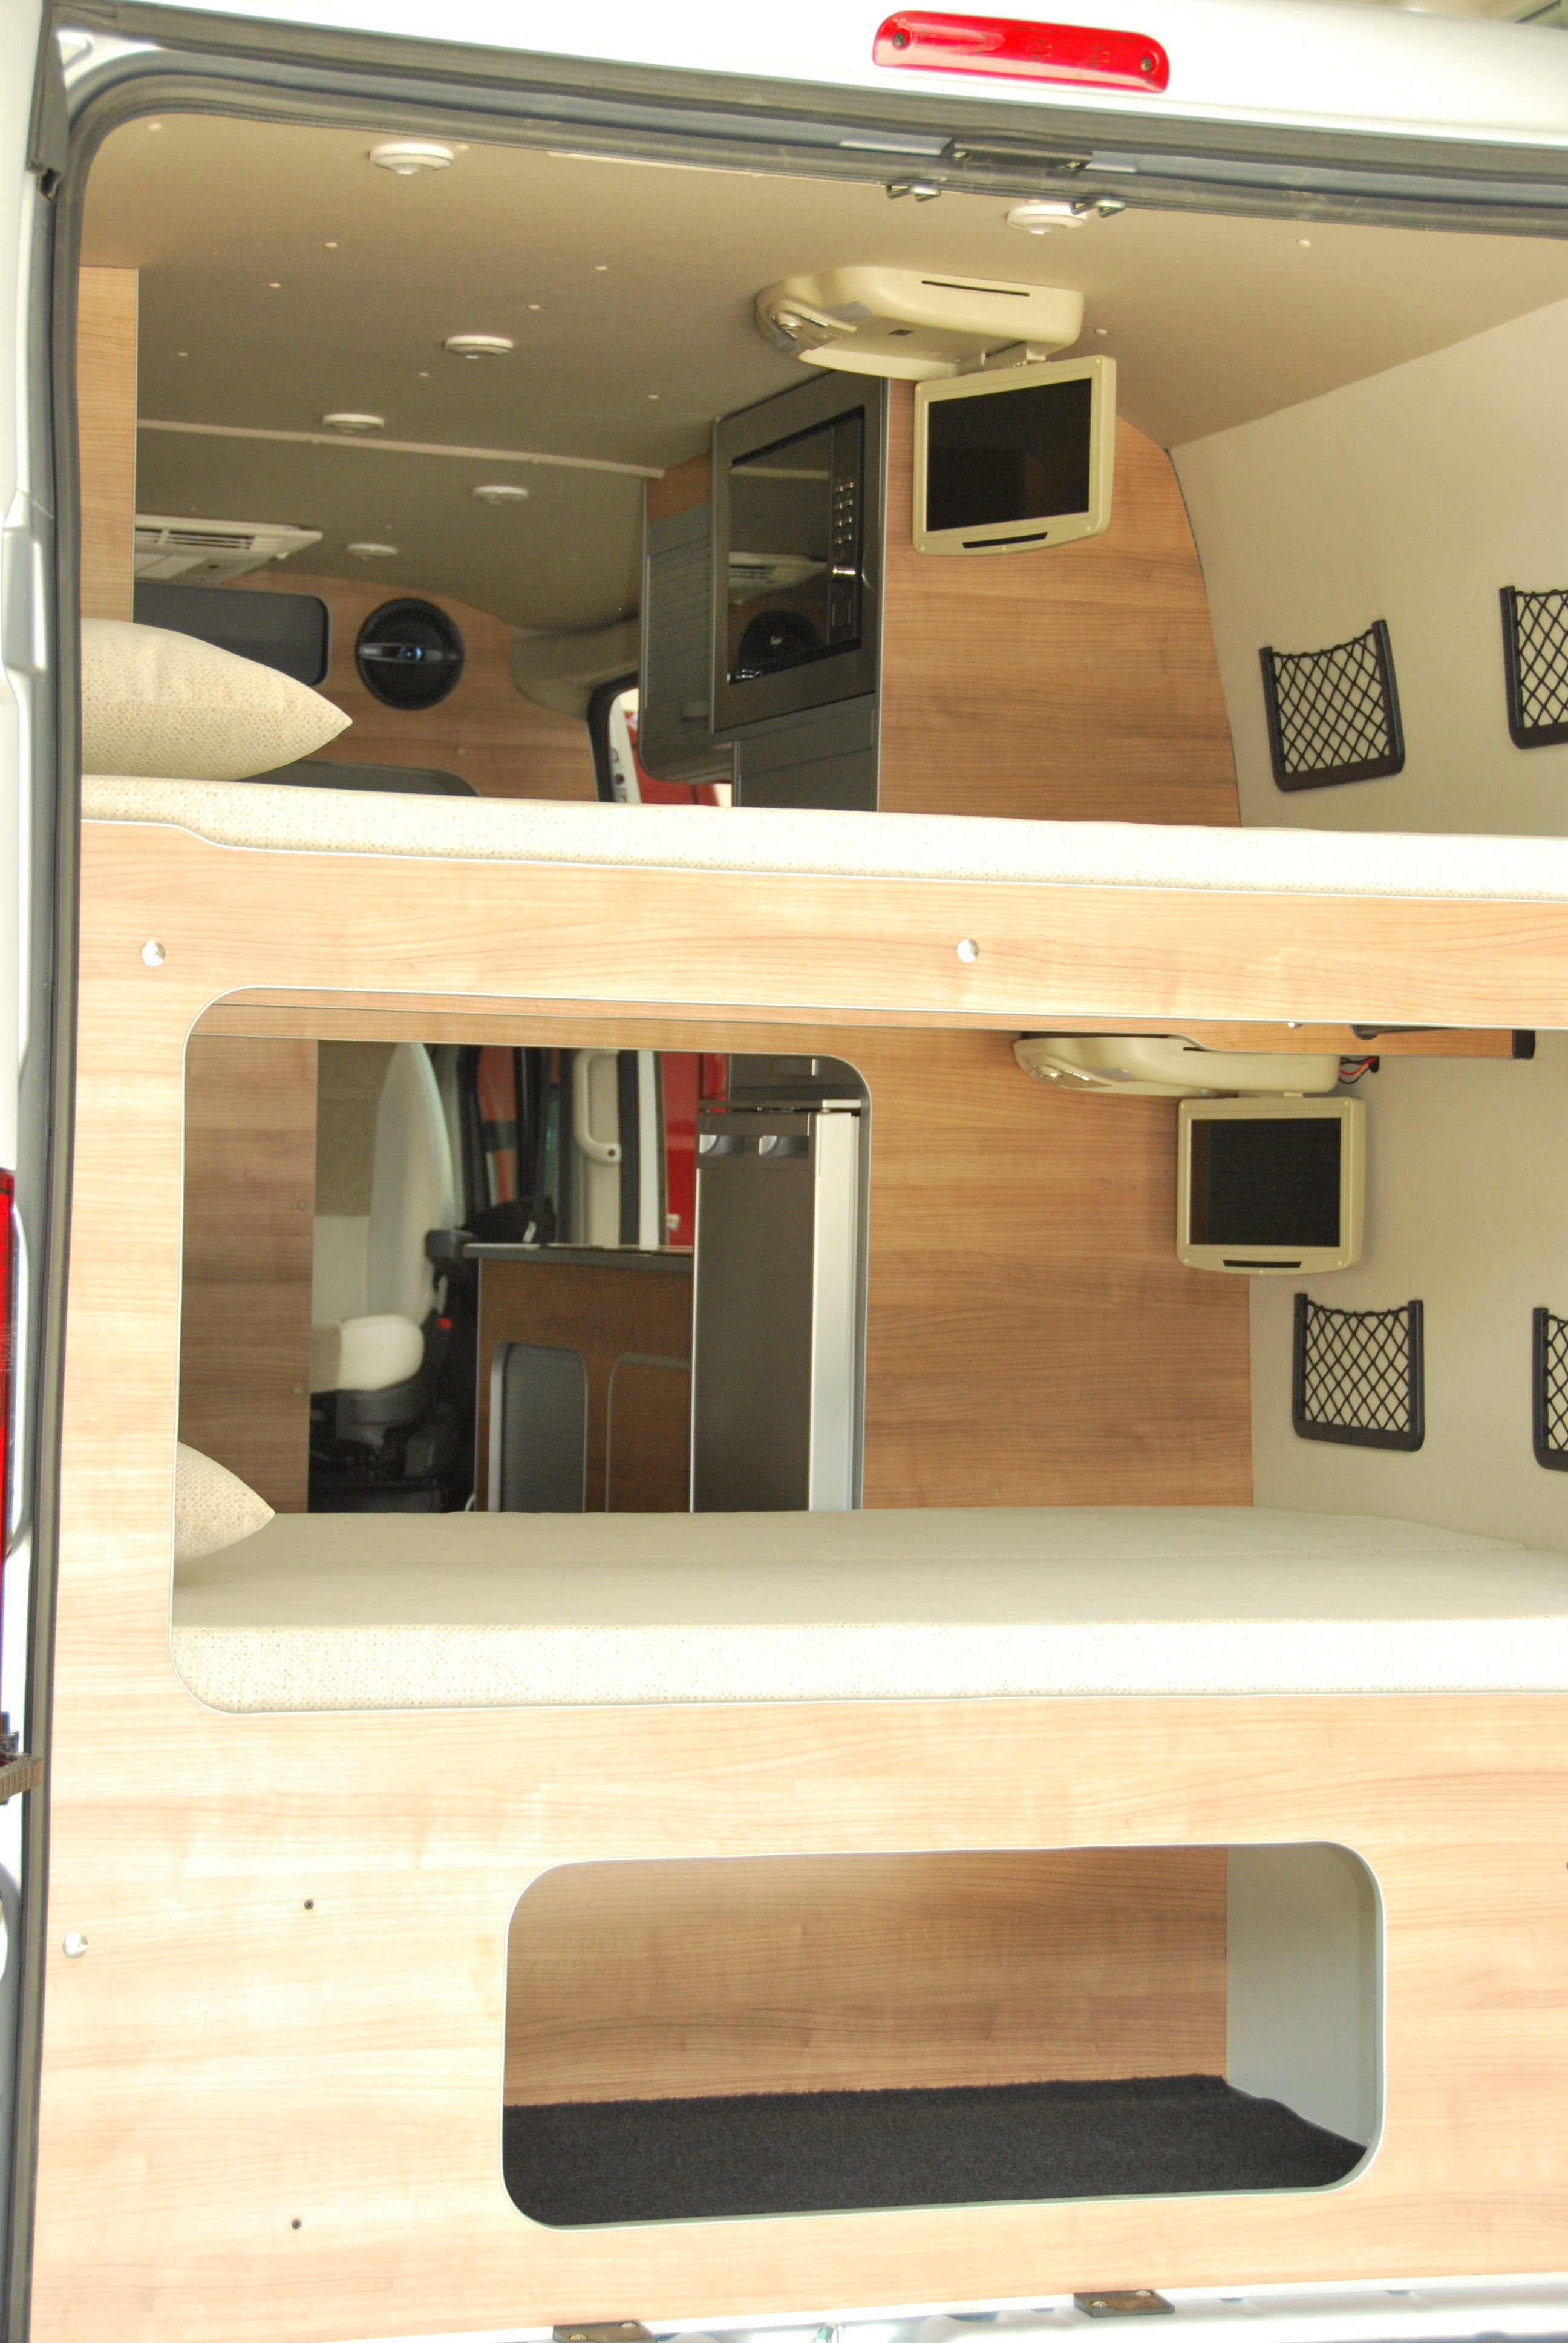 ducato motorhome fiat ducato campervan motorhome pinterest fourgon fourgon am nag et. Black Bedroom Furniture Sets. Home Design Ideas